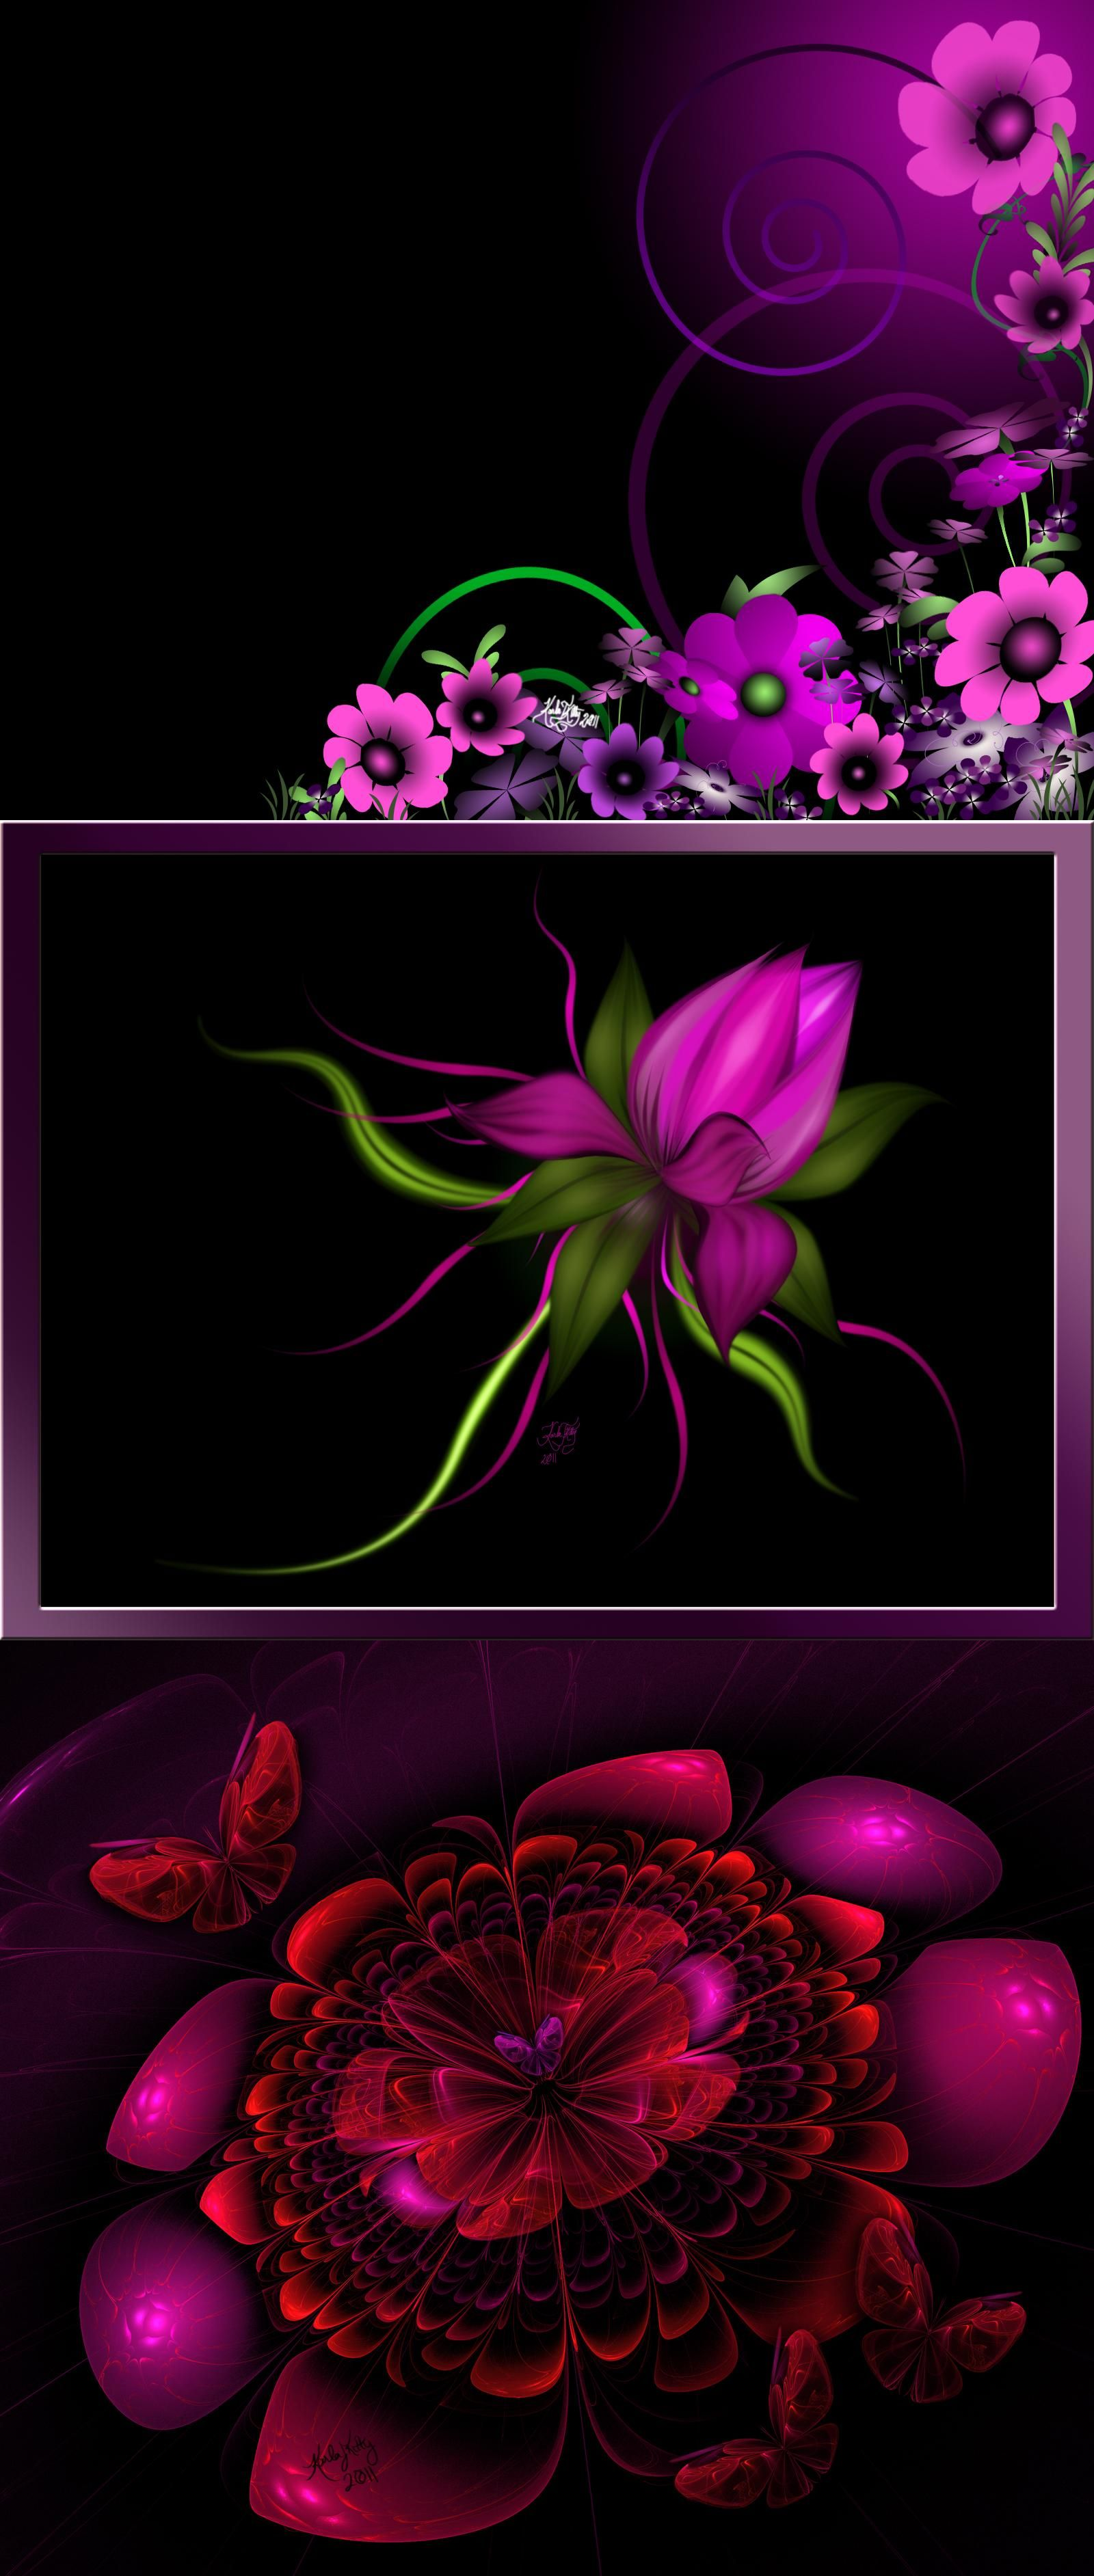 PINK FLOWER BURST Iphone wallpaper, Pink lipstick